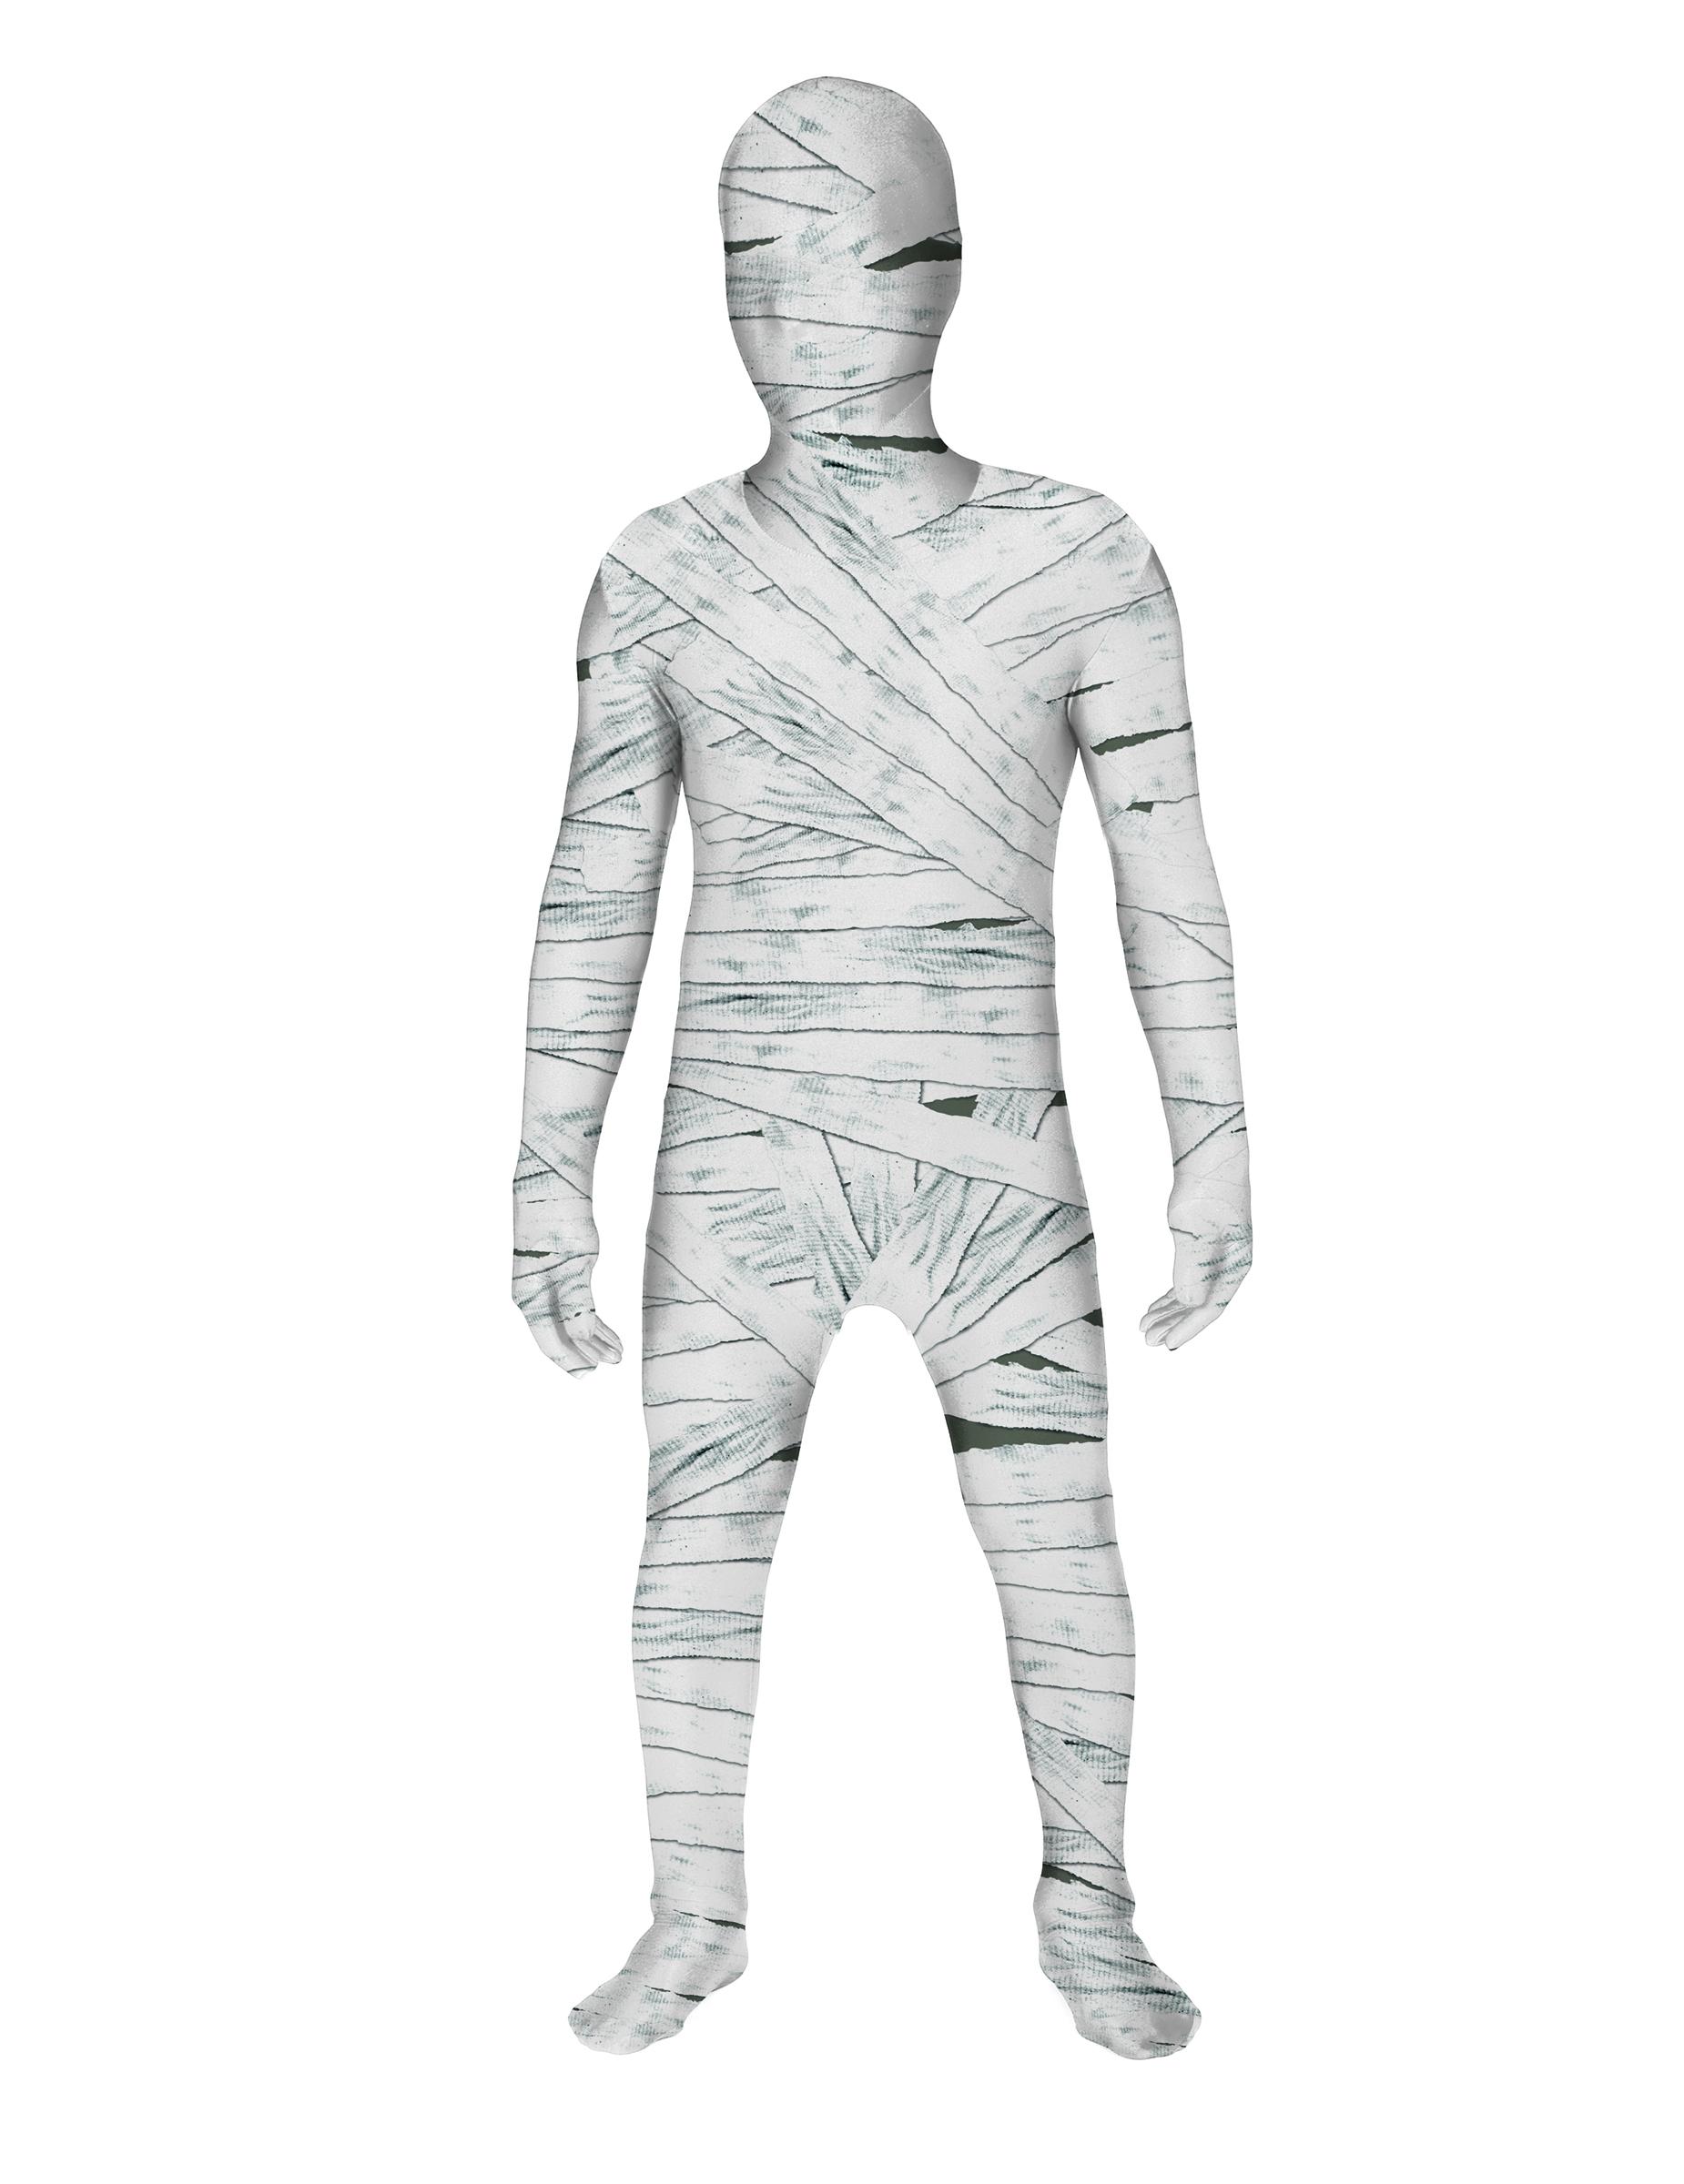 morphsuits mumien kinderkost m f r halloween. Black Bedroom Furniture Sets. Home Design Ideas